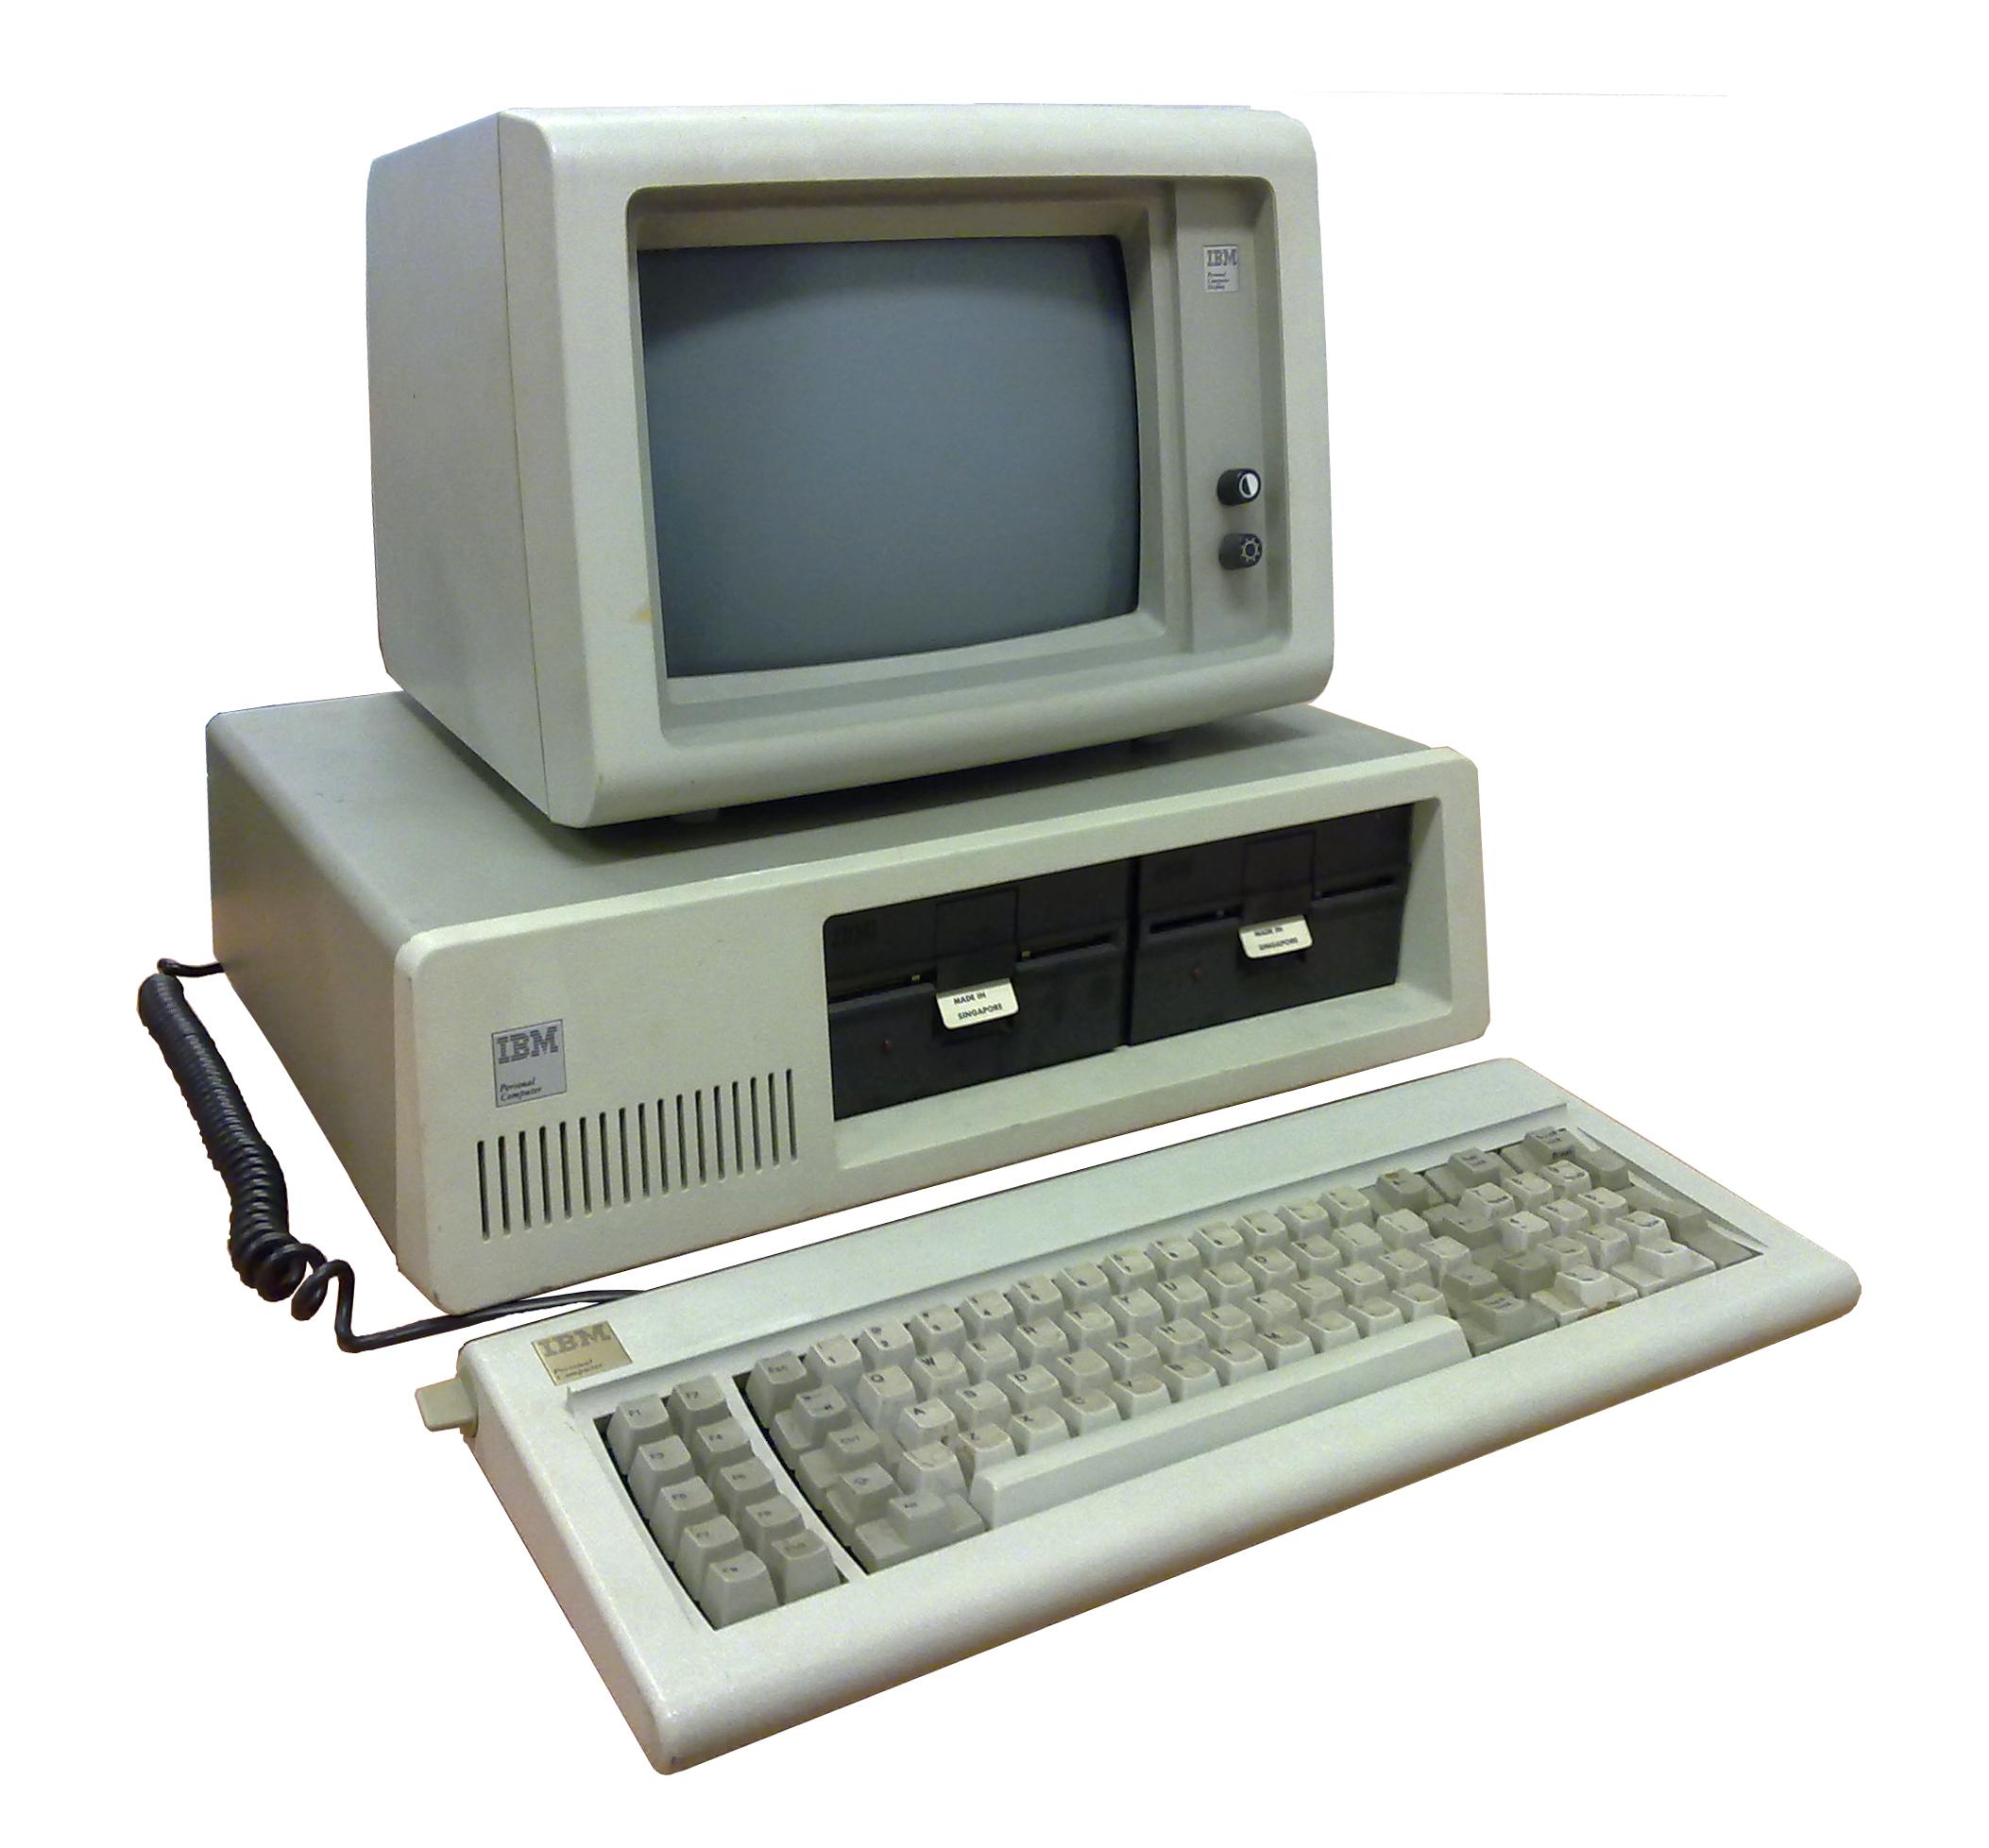 Desktop Computer Wikipedia 1 Set Komputer Ibm 5150 Personal